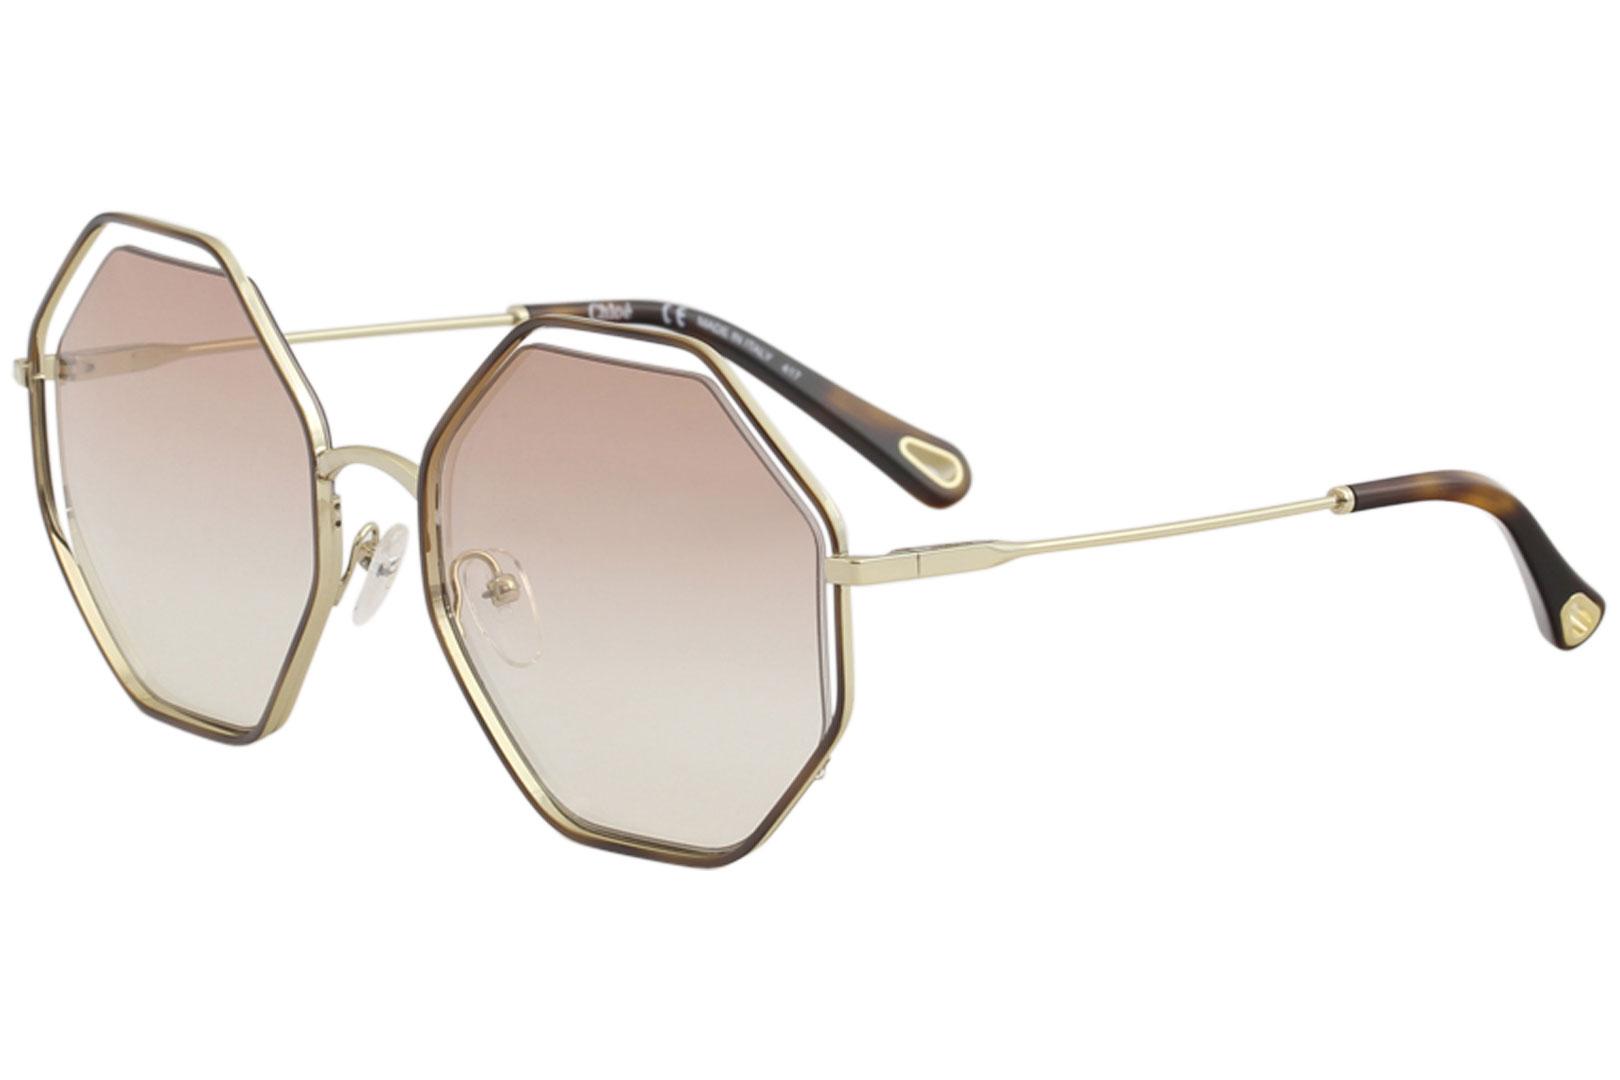 db7e42ae54ec Details about Chloe Women s CE132S CE 132 S 211 Havana Peach Fashion Round  Sunglasses 58mm